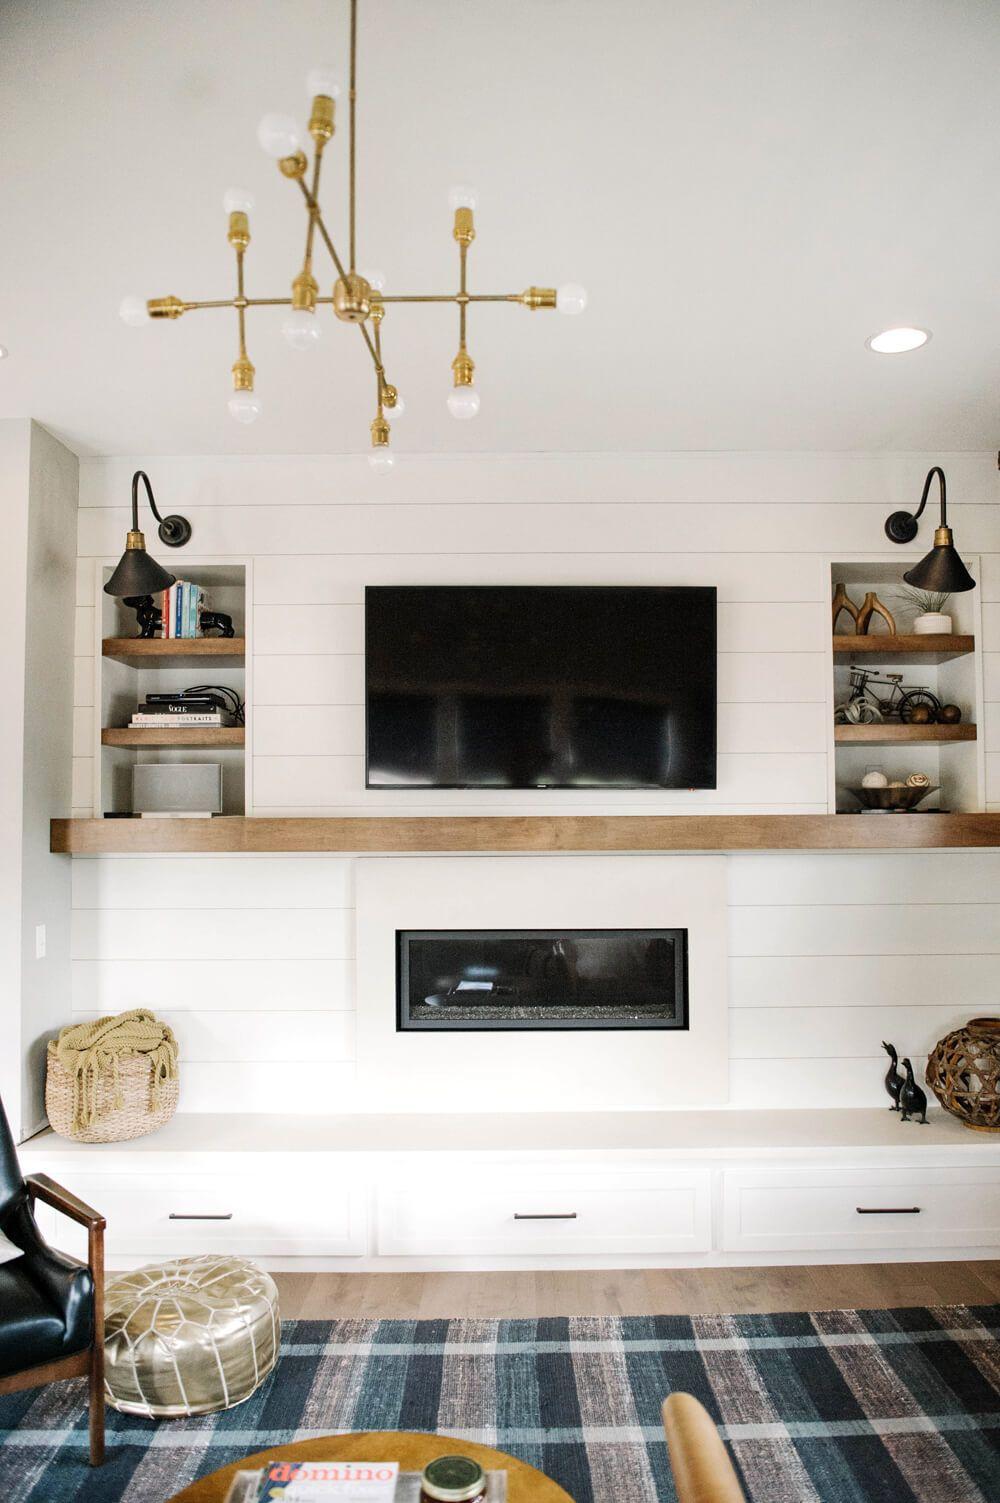 17 Modern Fireplace Tile Ideas Best Design For The